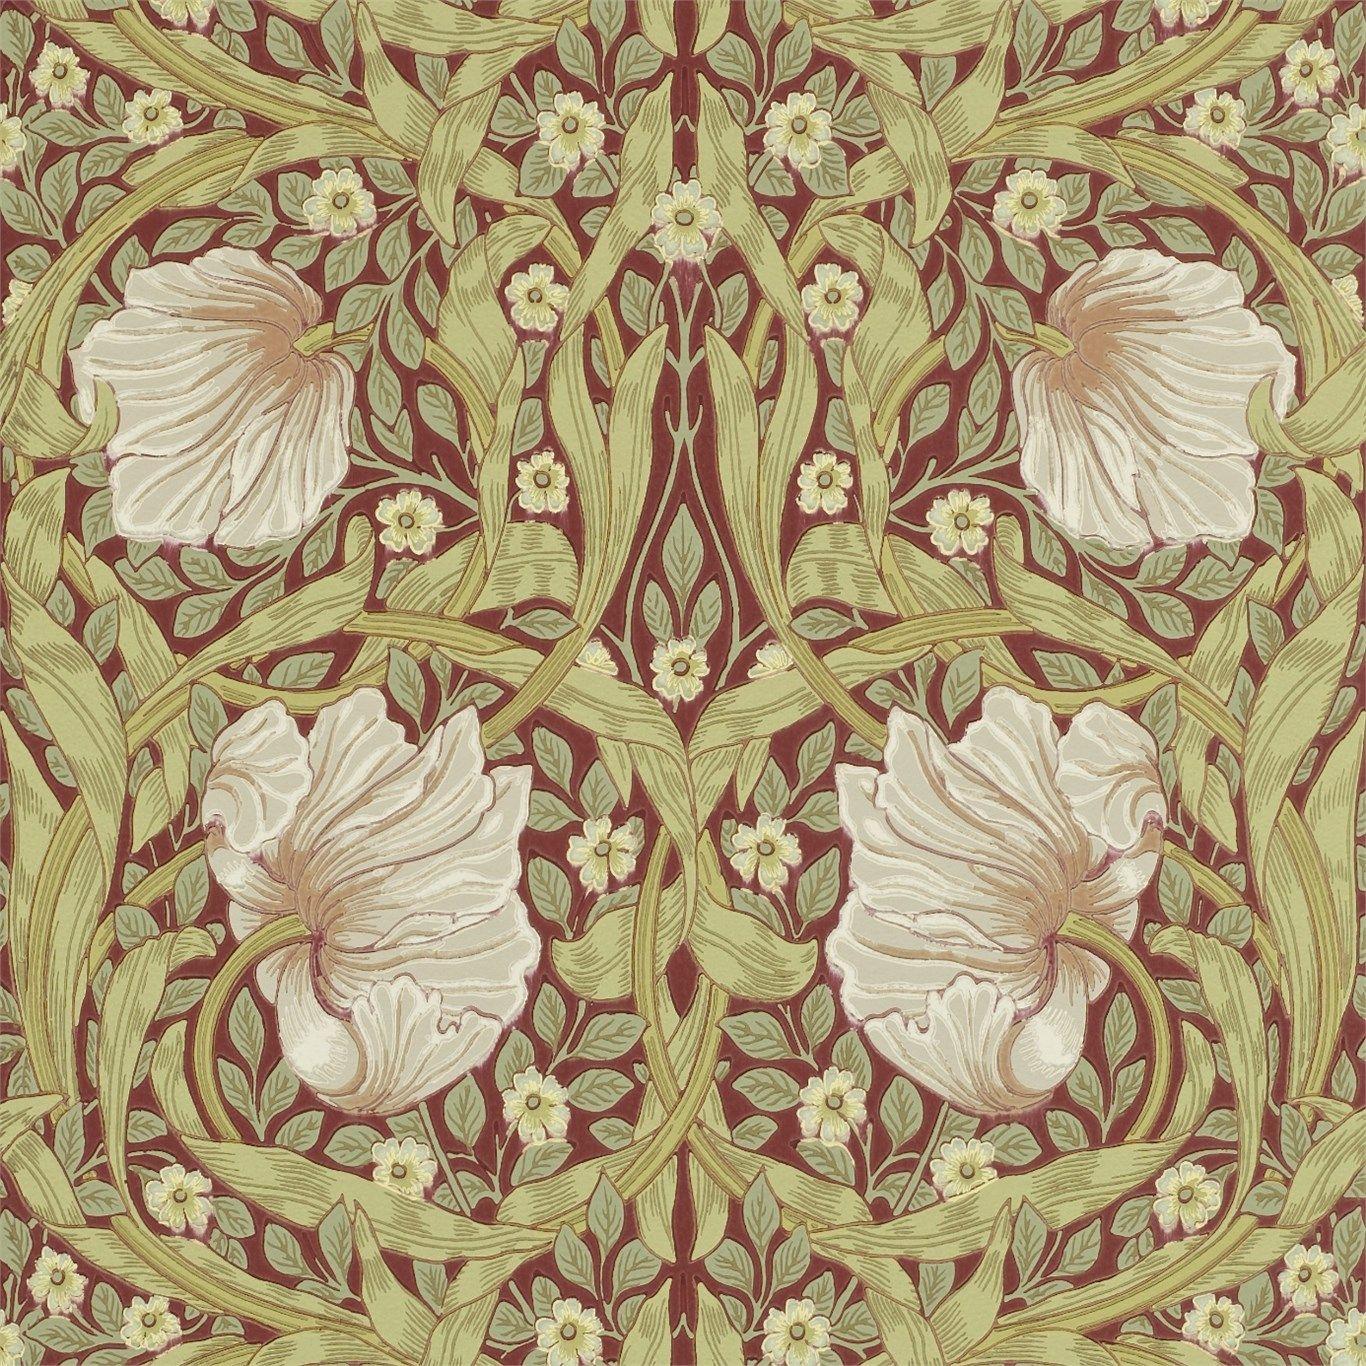 The Original Morris Co Arts And Crafts Fabrics And Wallpaper Designs By William Morris Company Products British Kunstverk Kunstideer William Morris